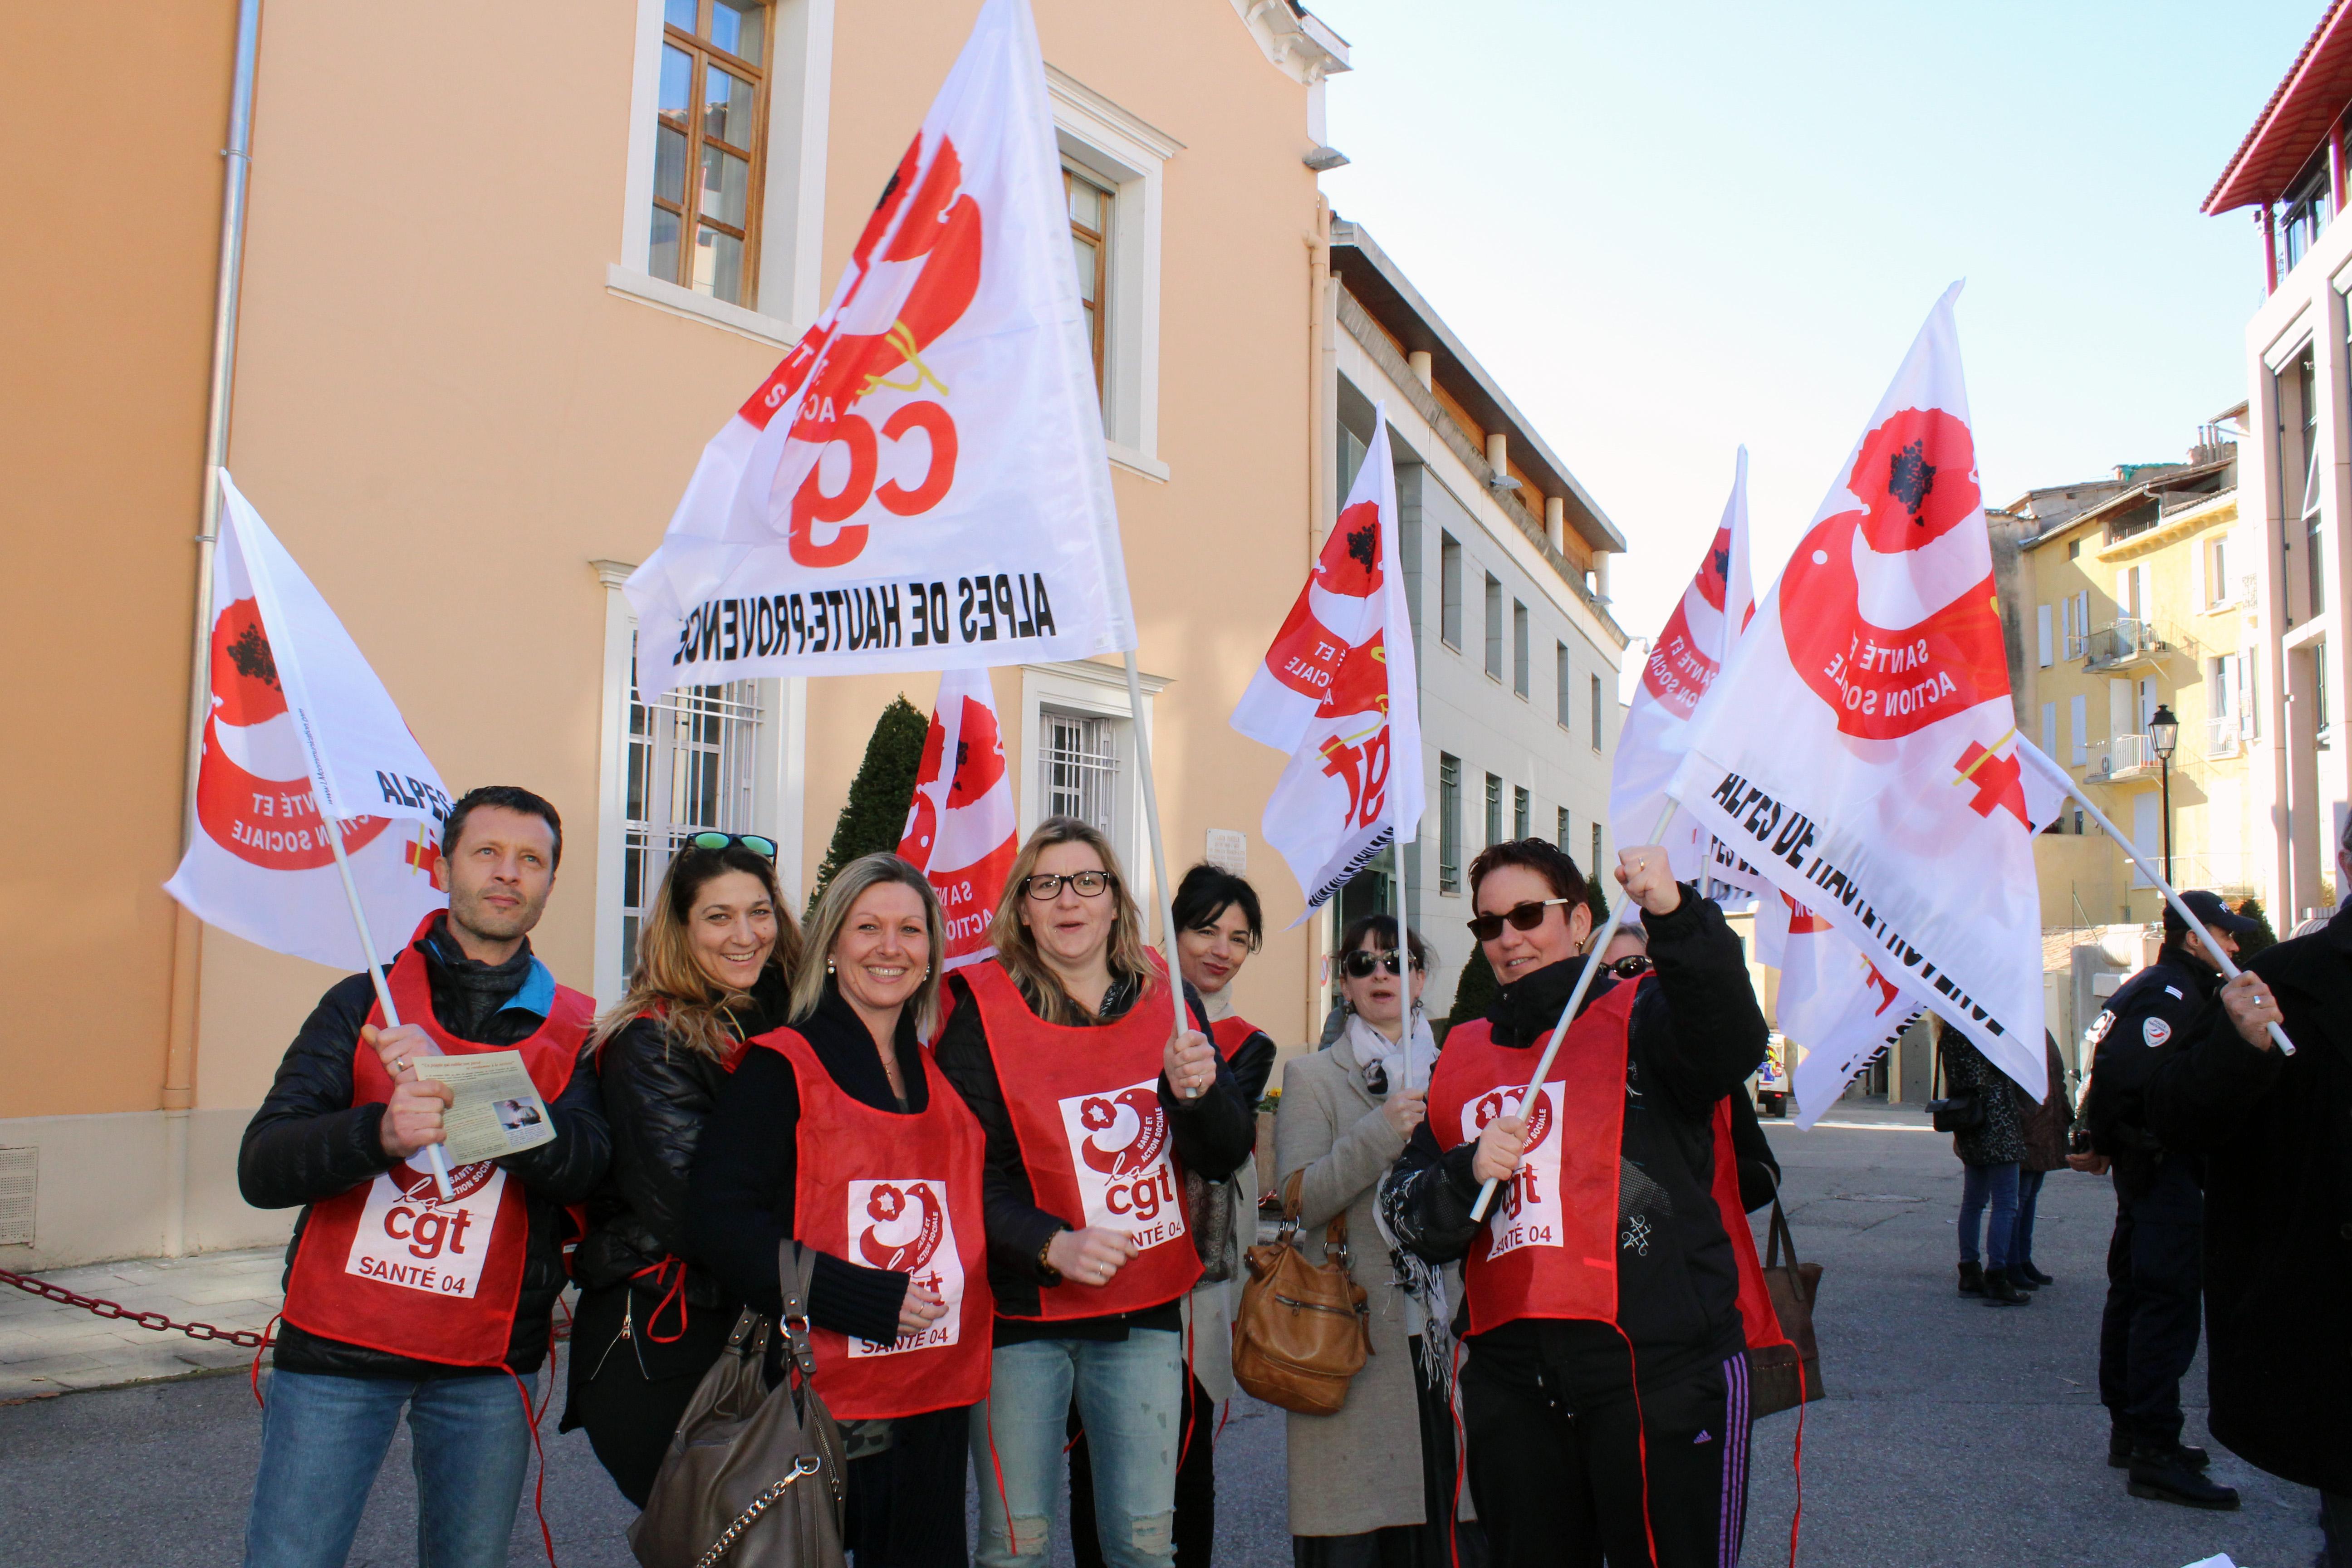 894. Grève EHPAD 30 janvier (1)